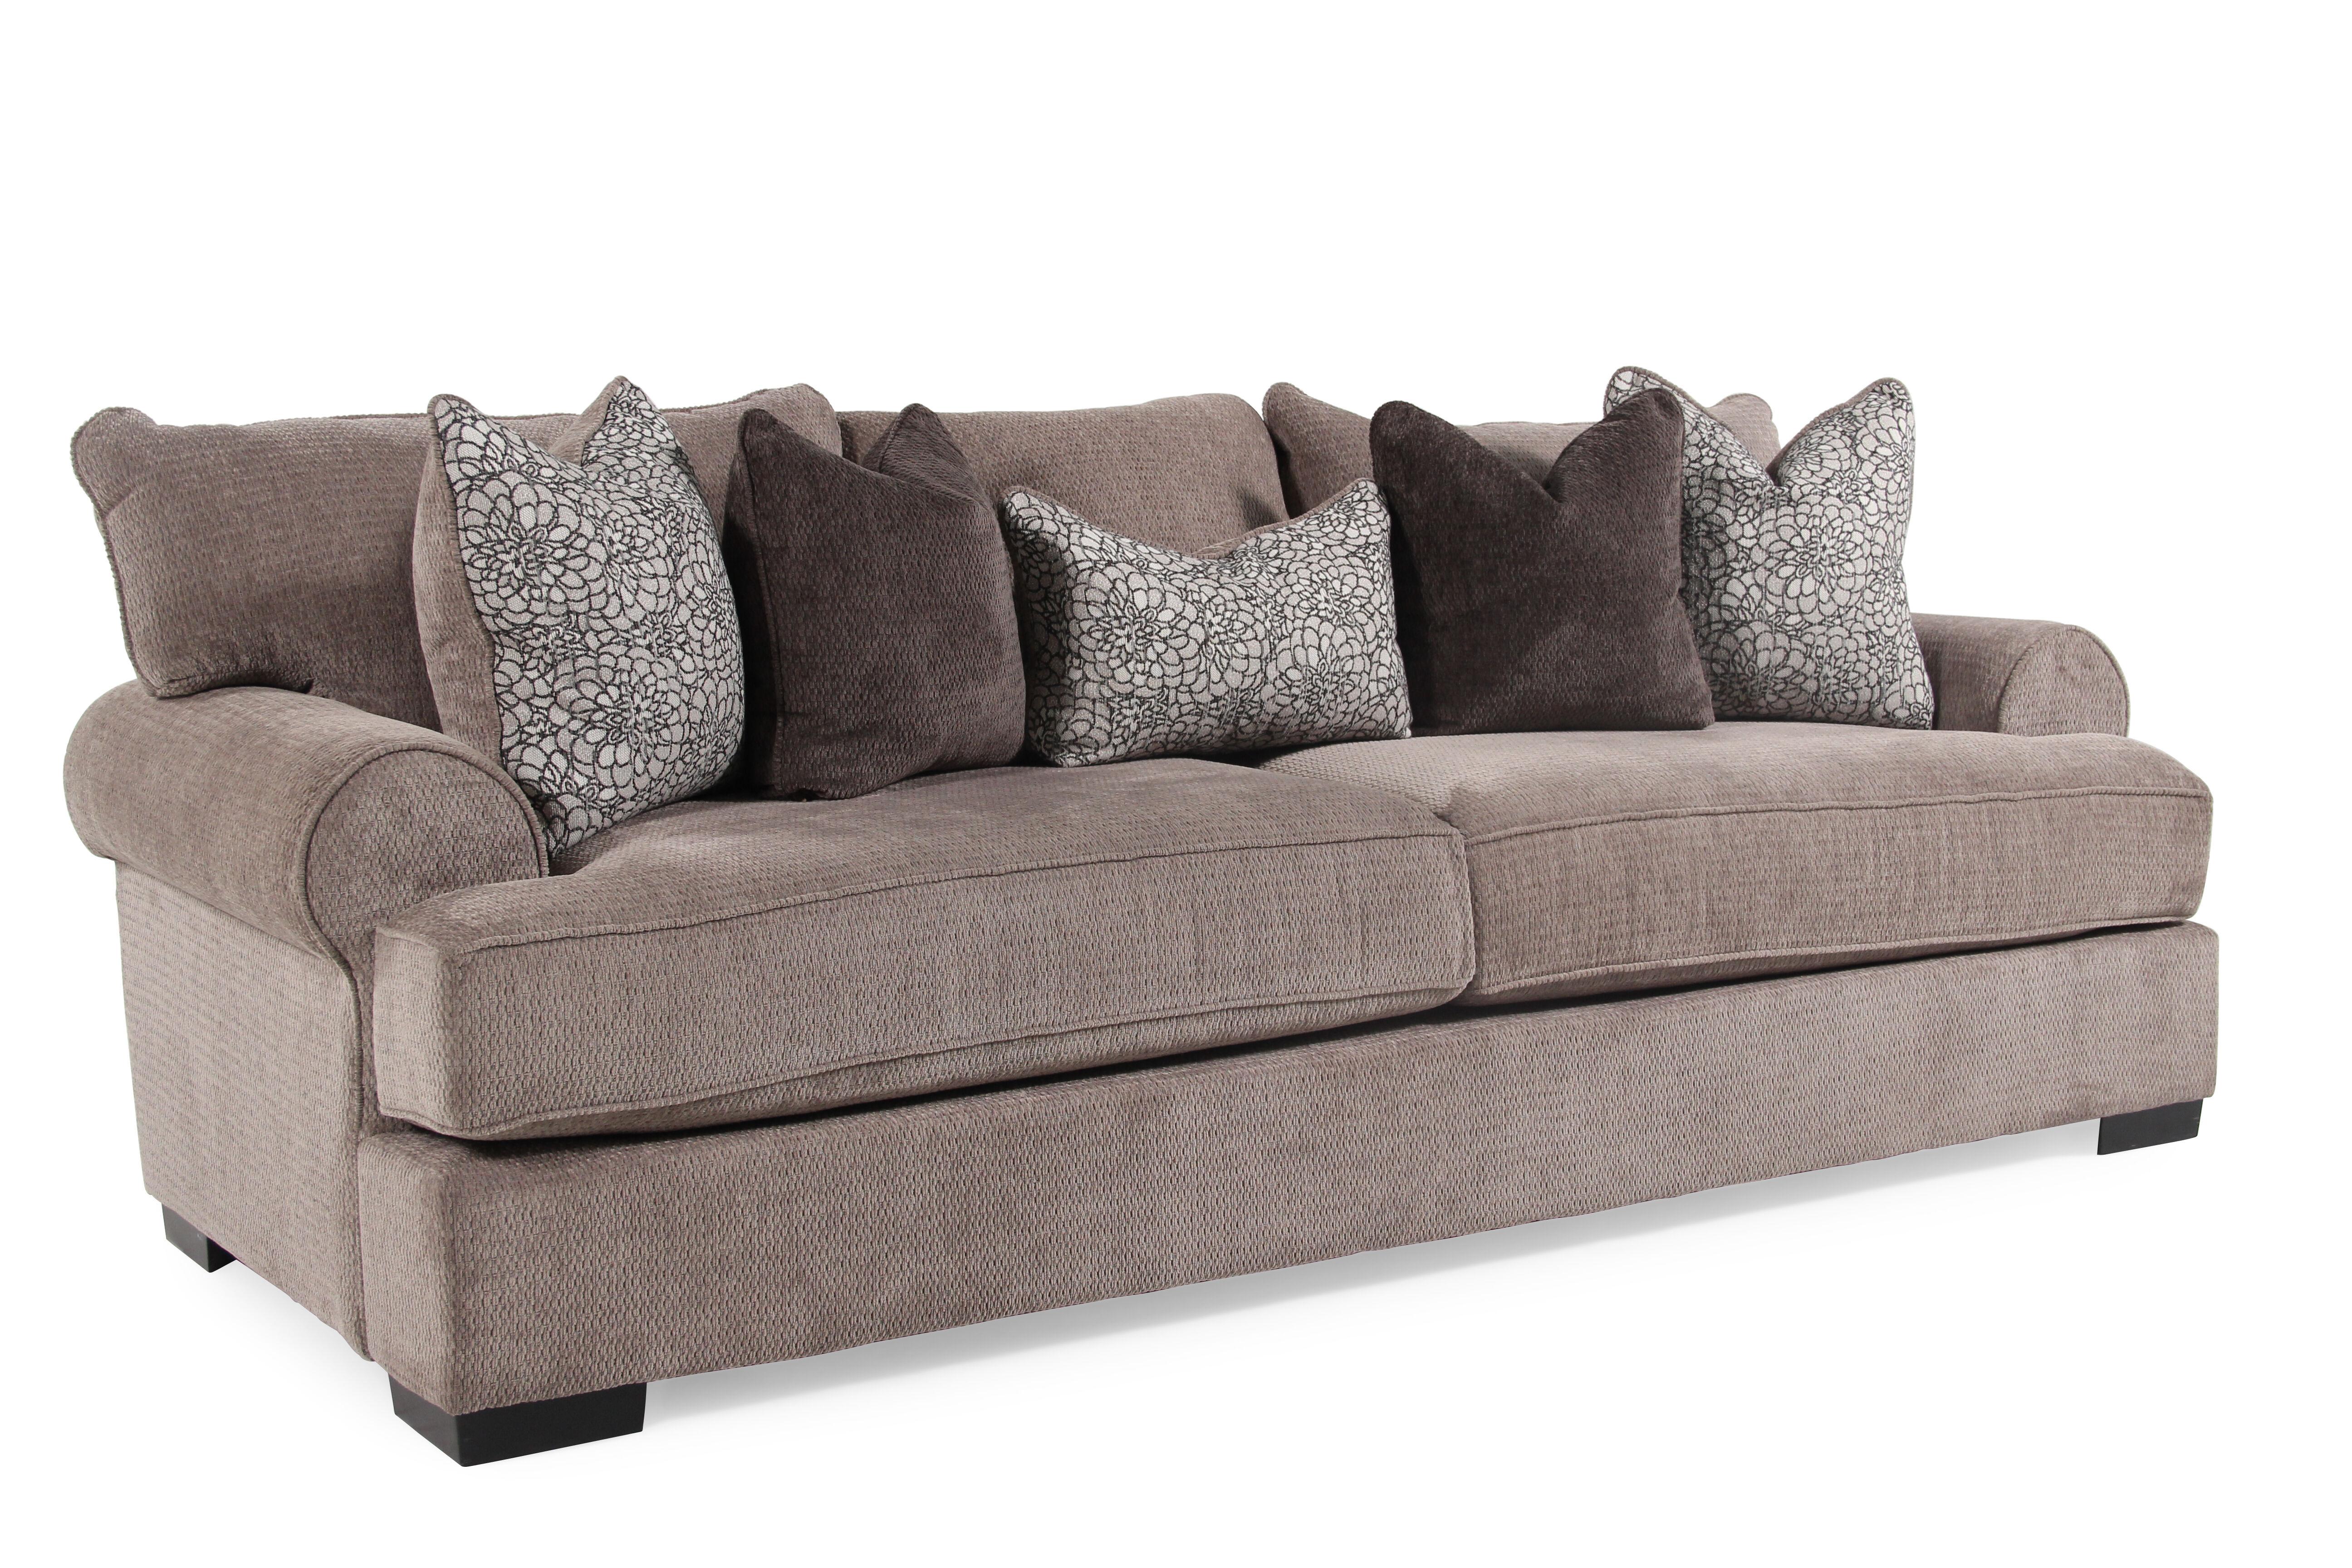 michael nicholas aspen sofa theater sectional reclining designs living room